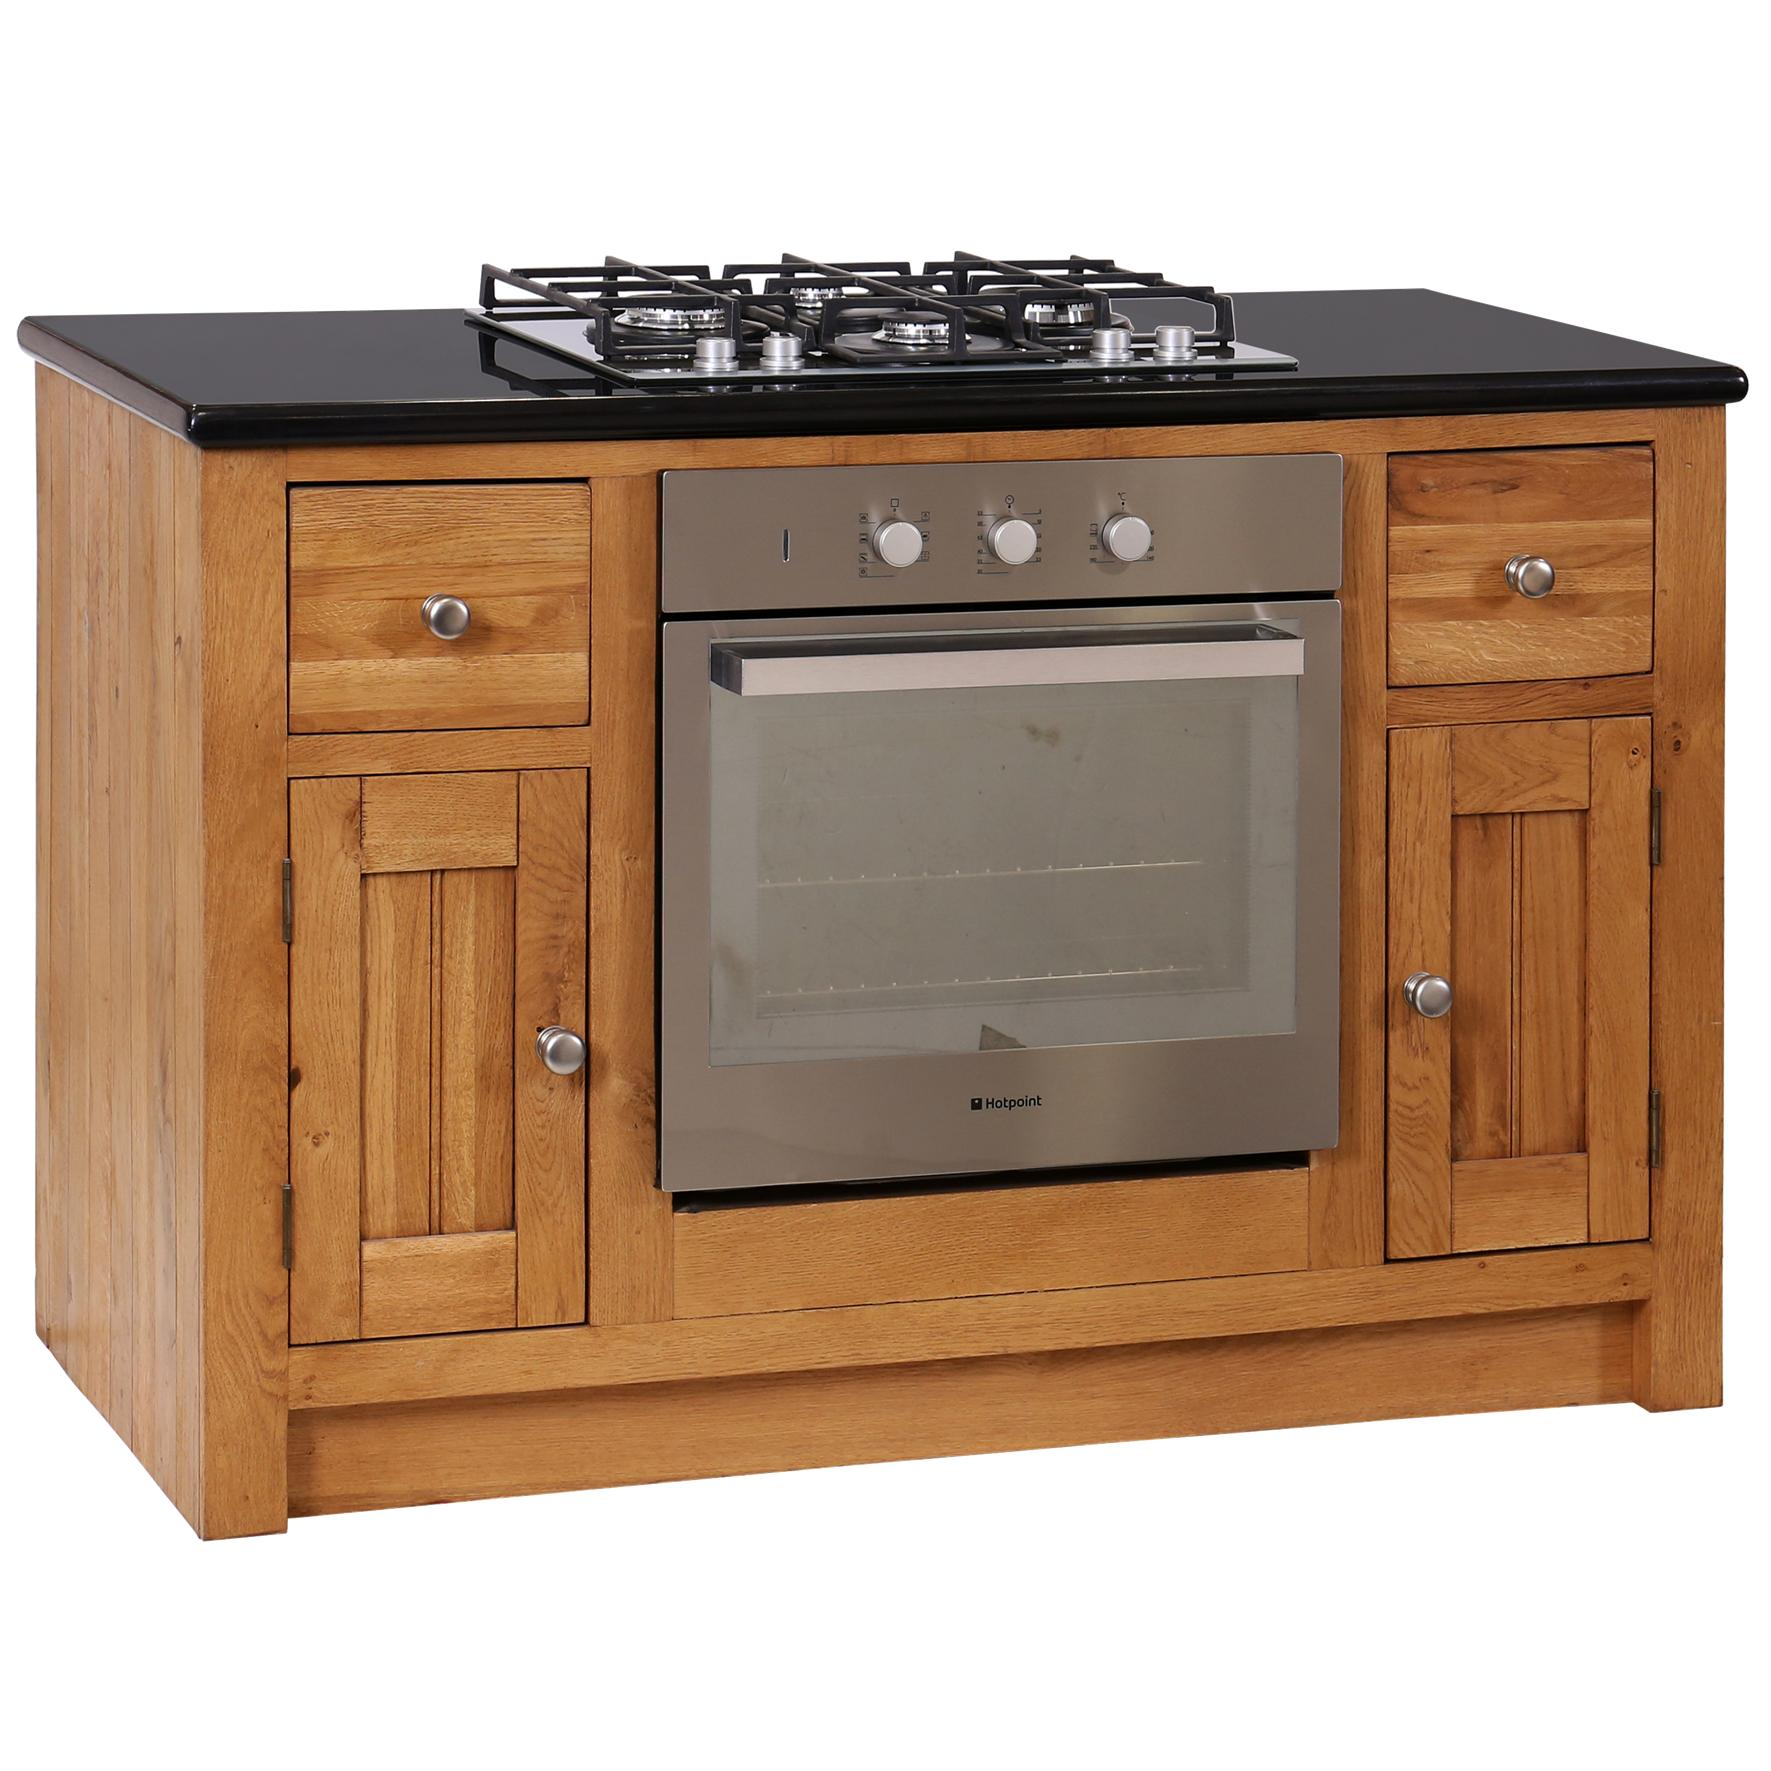 Oak Oven Unit